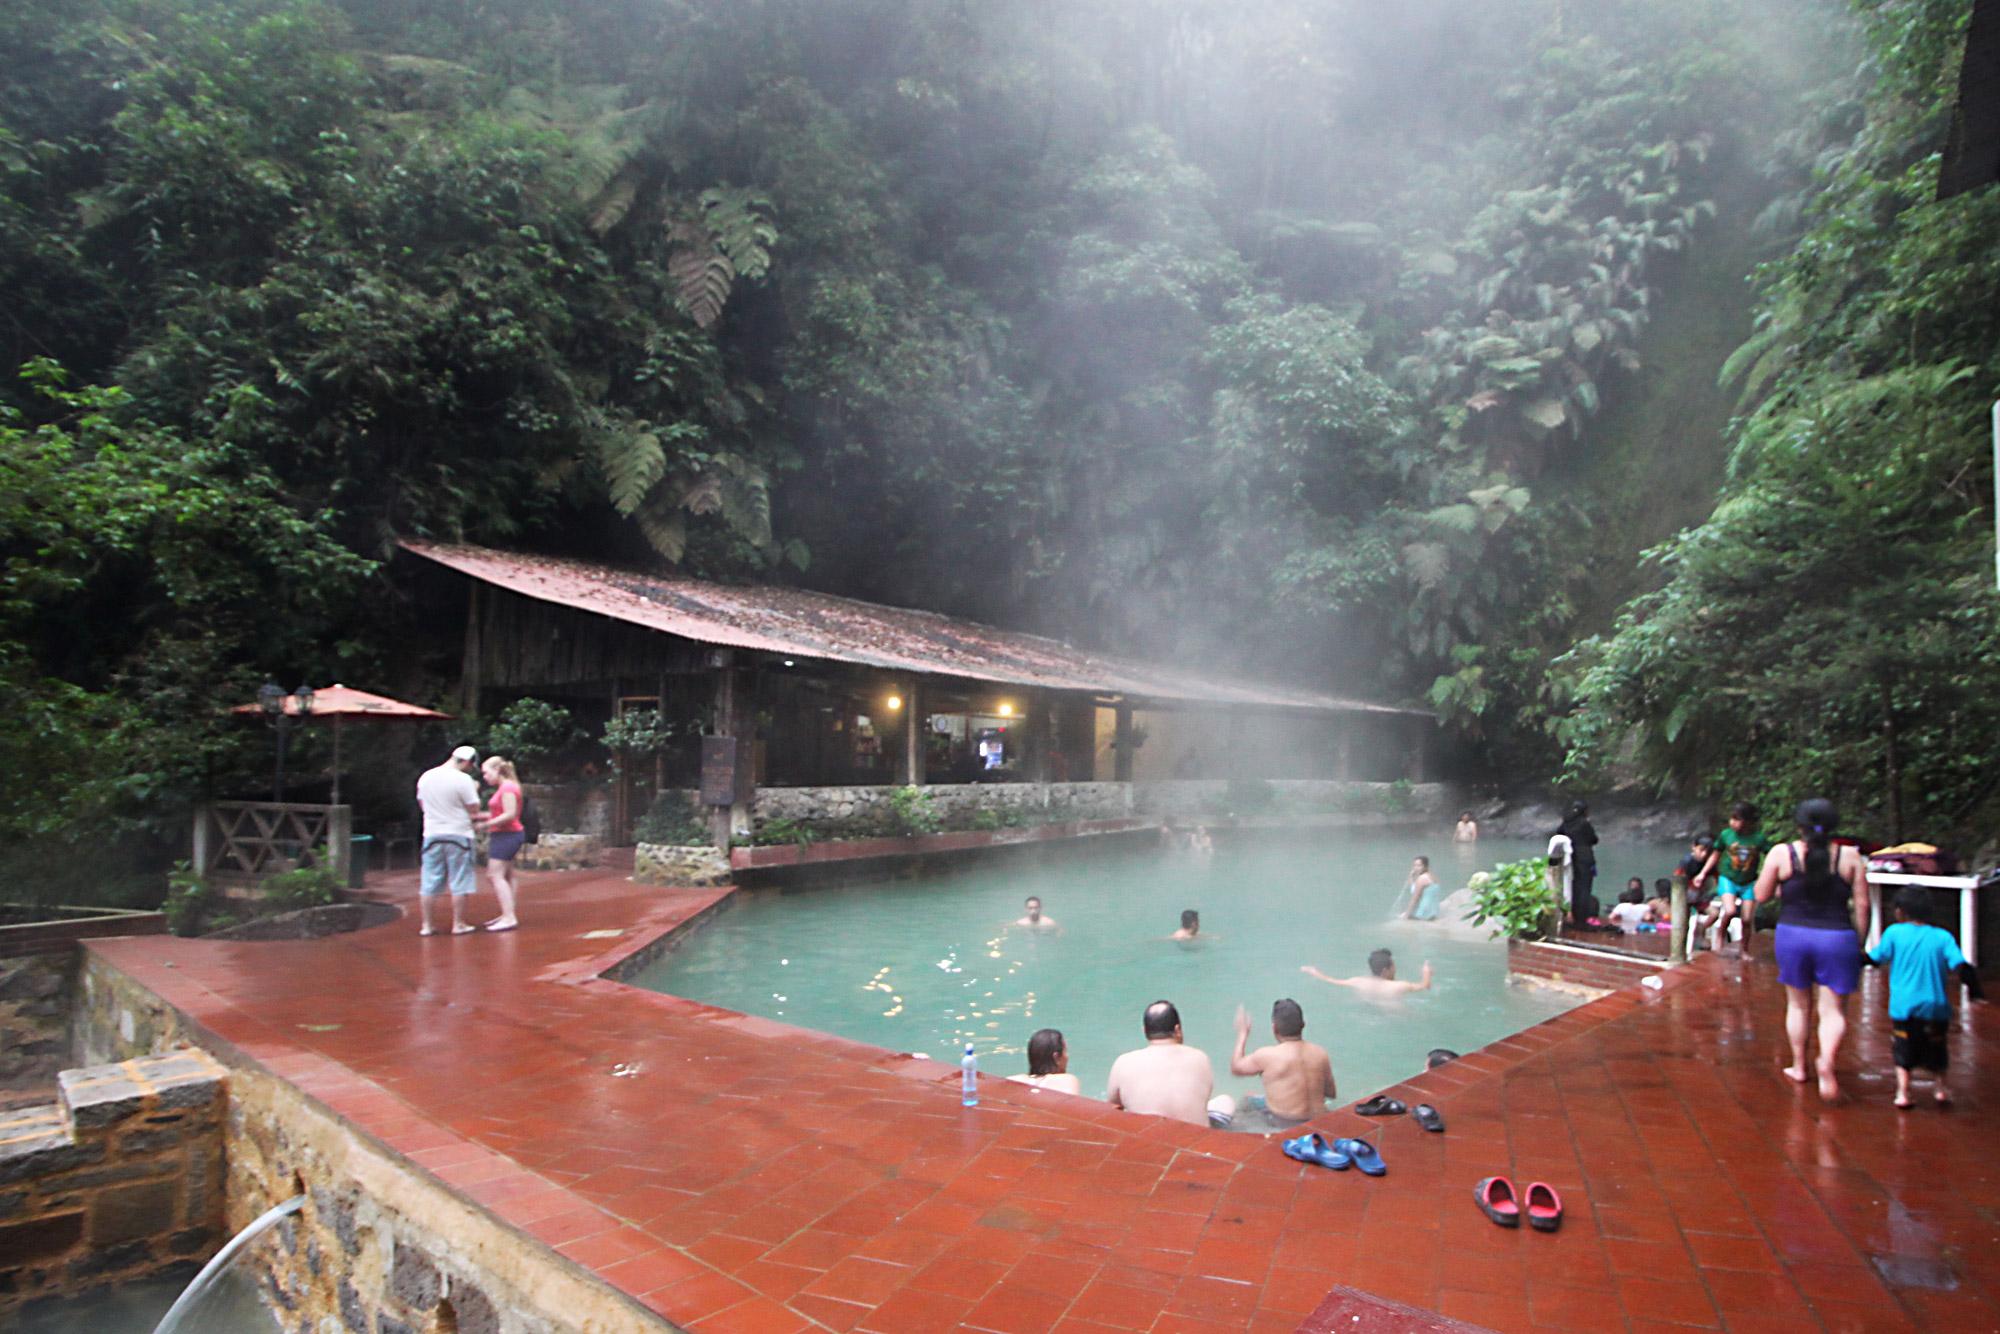 Guatemala 2015 - dag 12 - Warmwaterbronnen van Fuentes Georginas